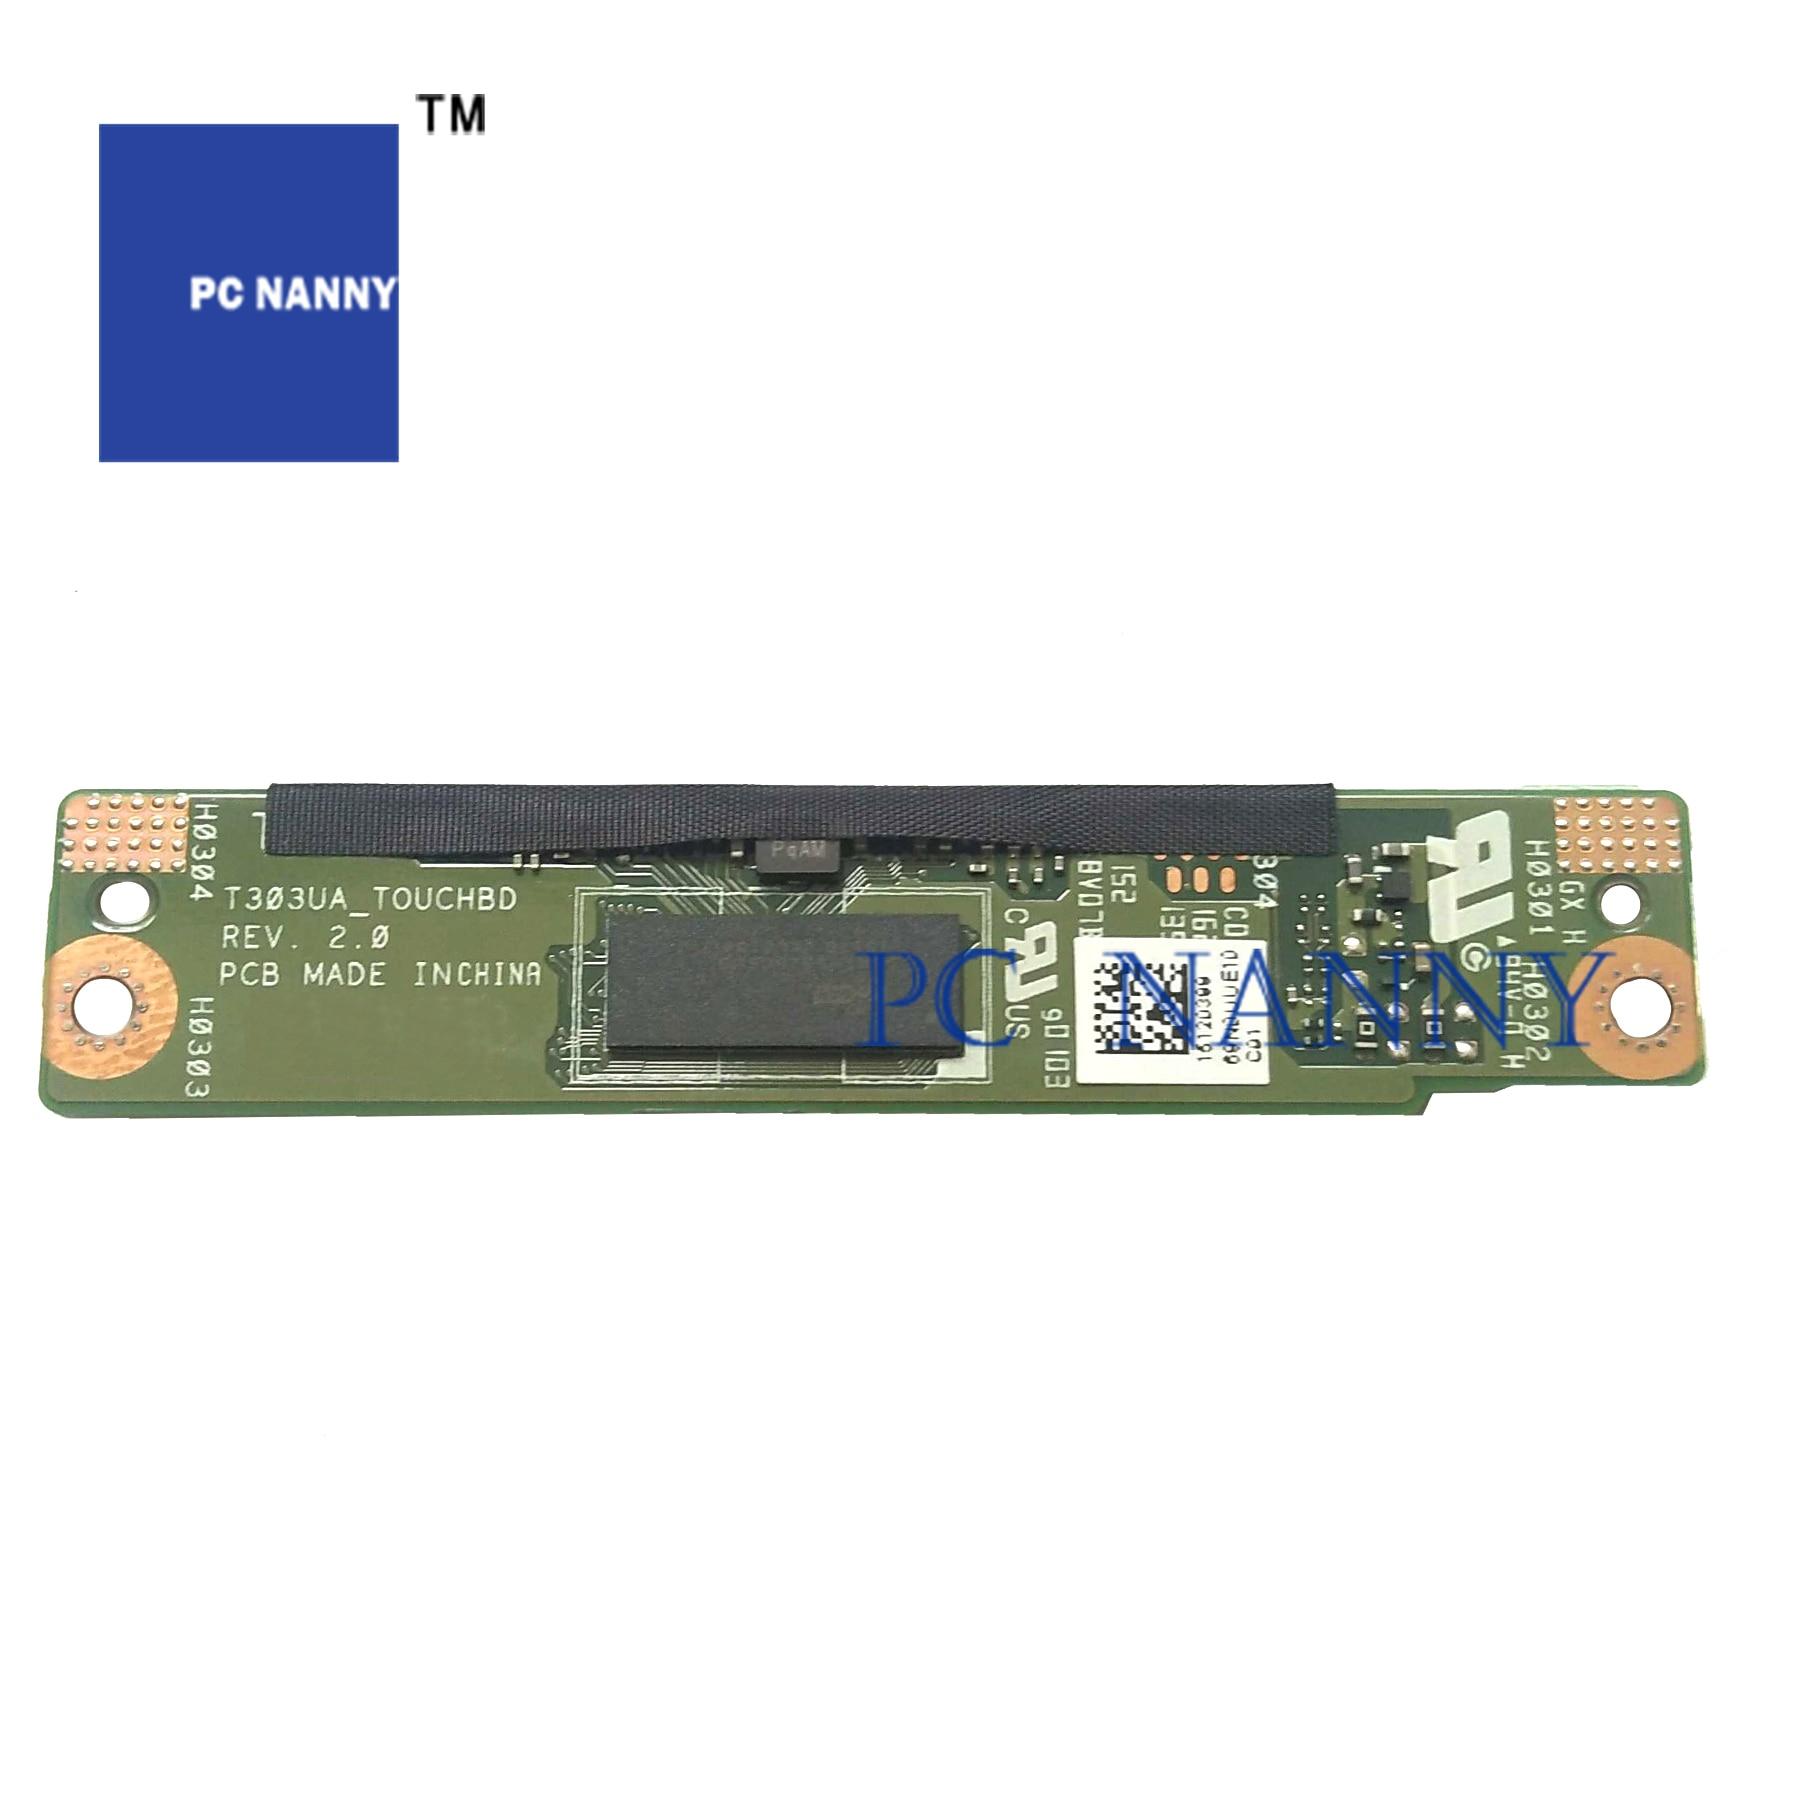 Pcnوالأرضيات لـ Asus Pro T303 T303UA T303U ، لوحة توشا SD ، زر طاقة ، مكبرات صوت اختبار جيدة